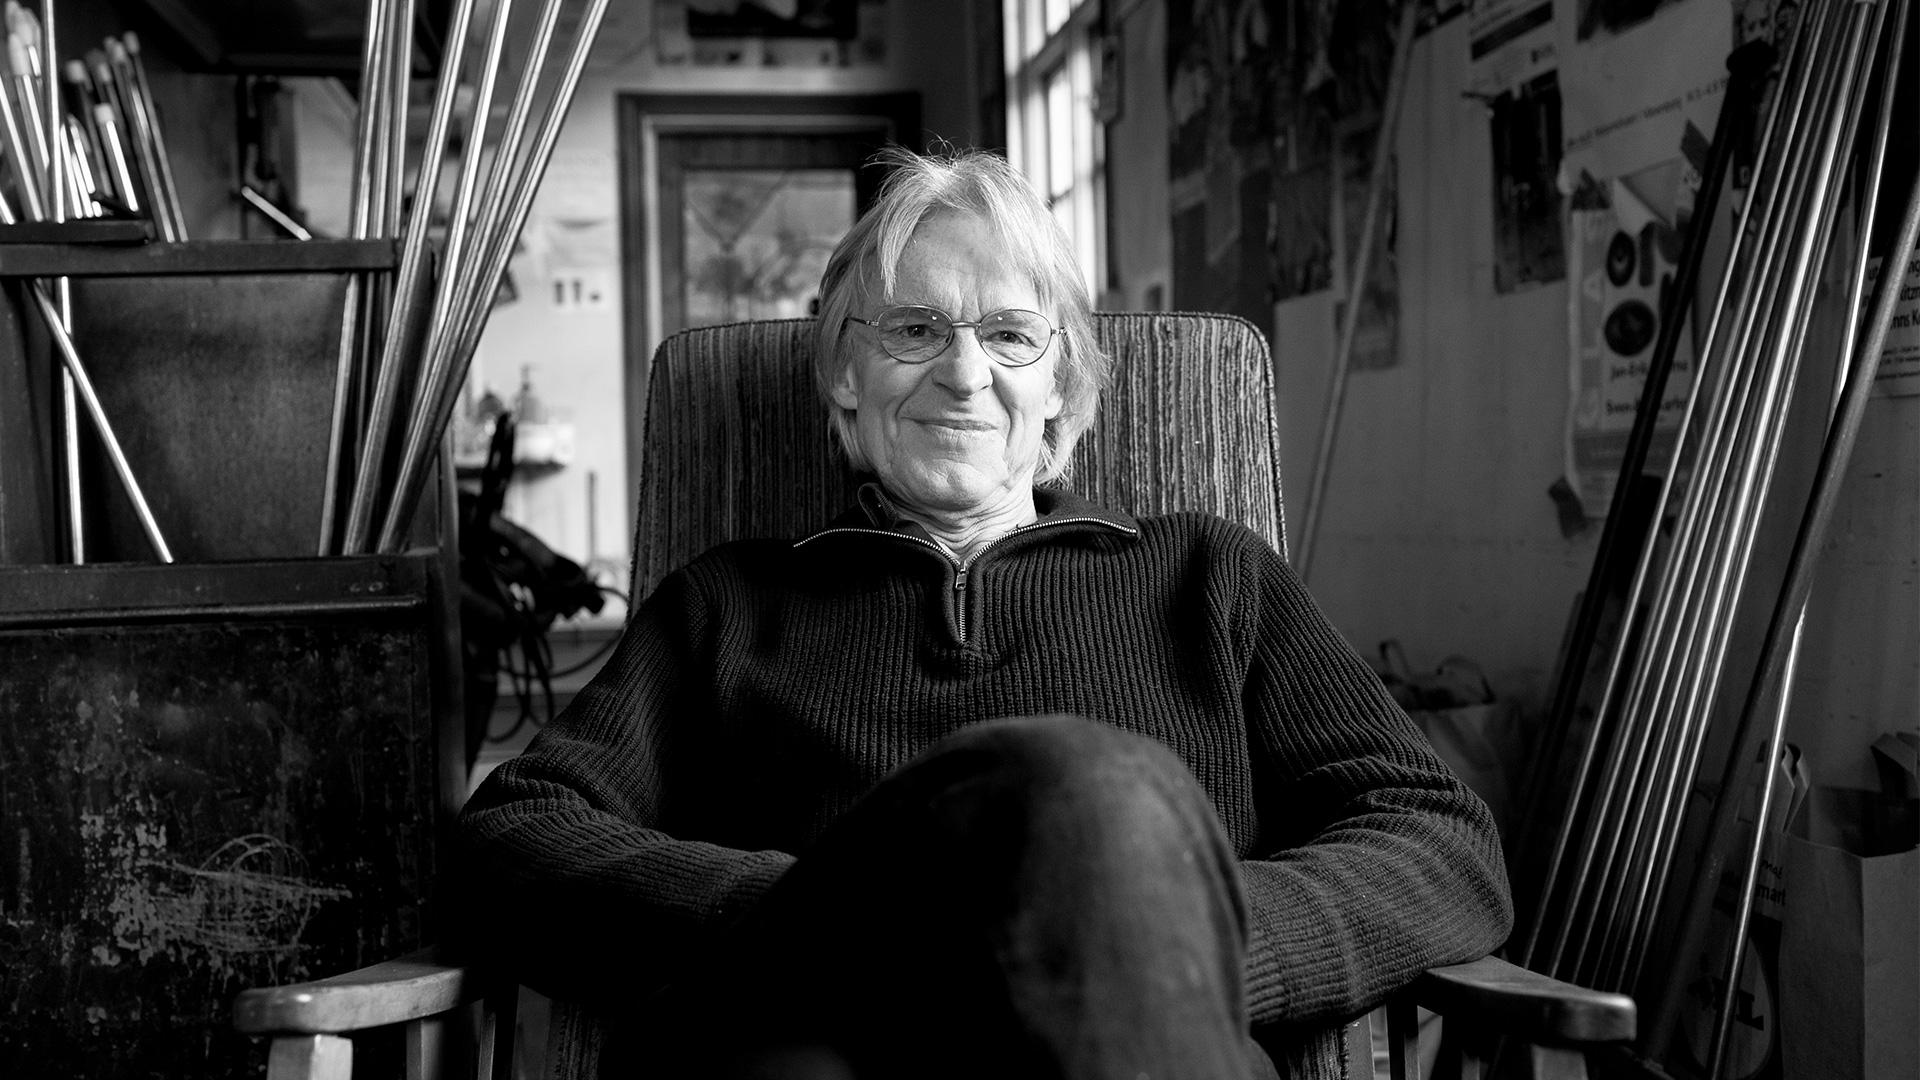 Sven Åke Carlsson